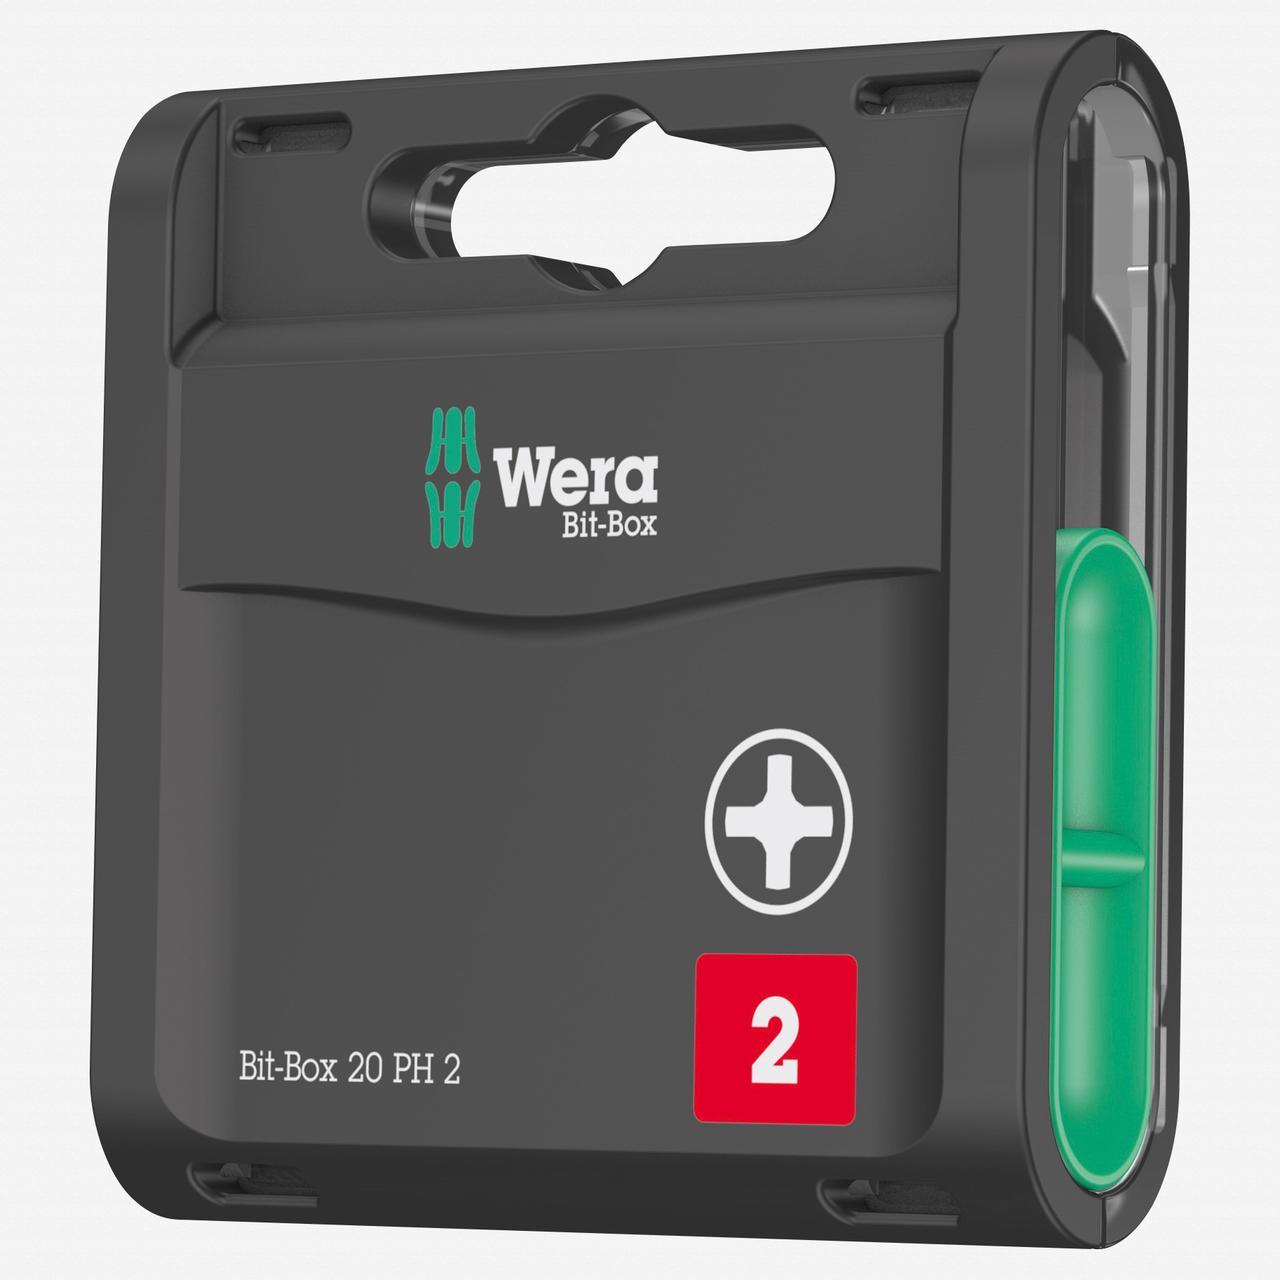 Wera 057750 Bit-Box 20 PH Phillips #2 - KC Tool